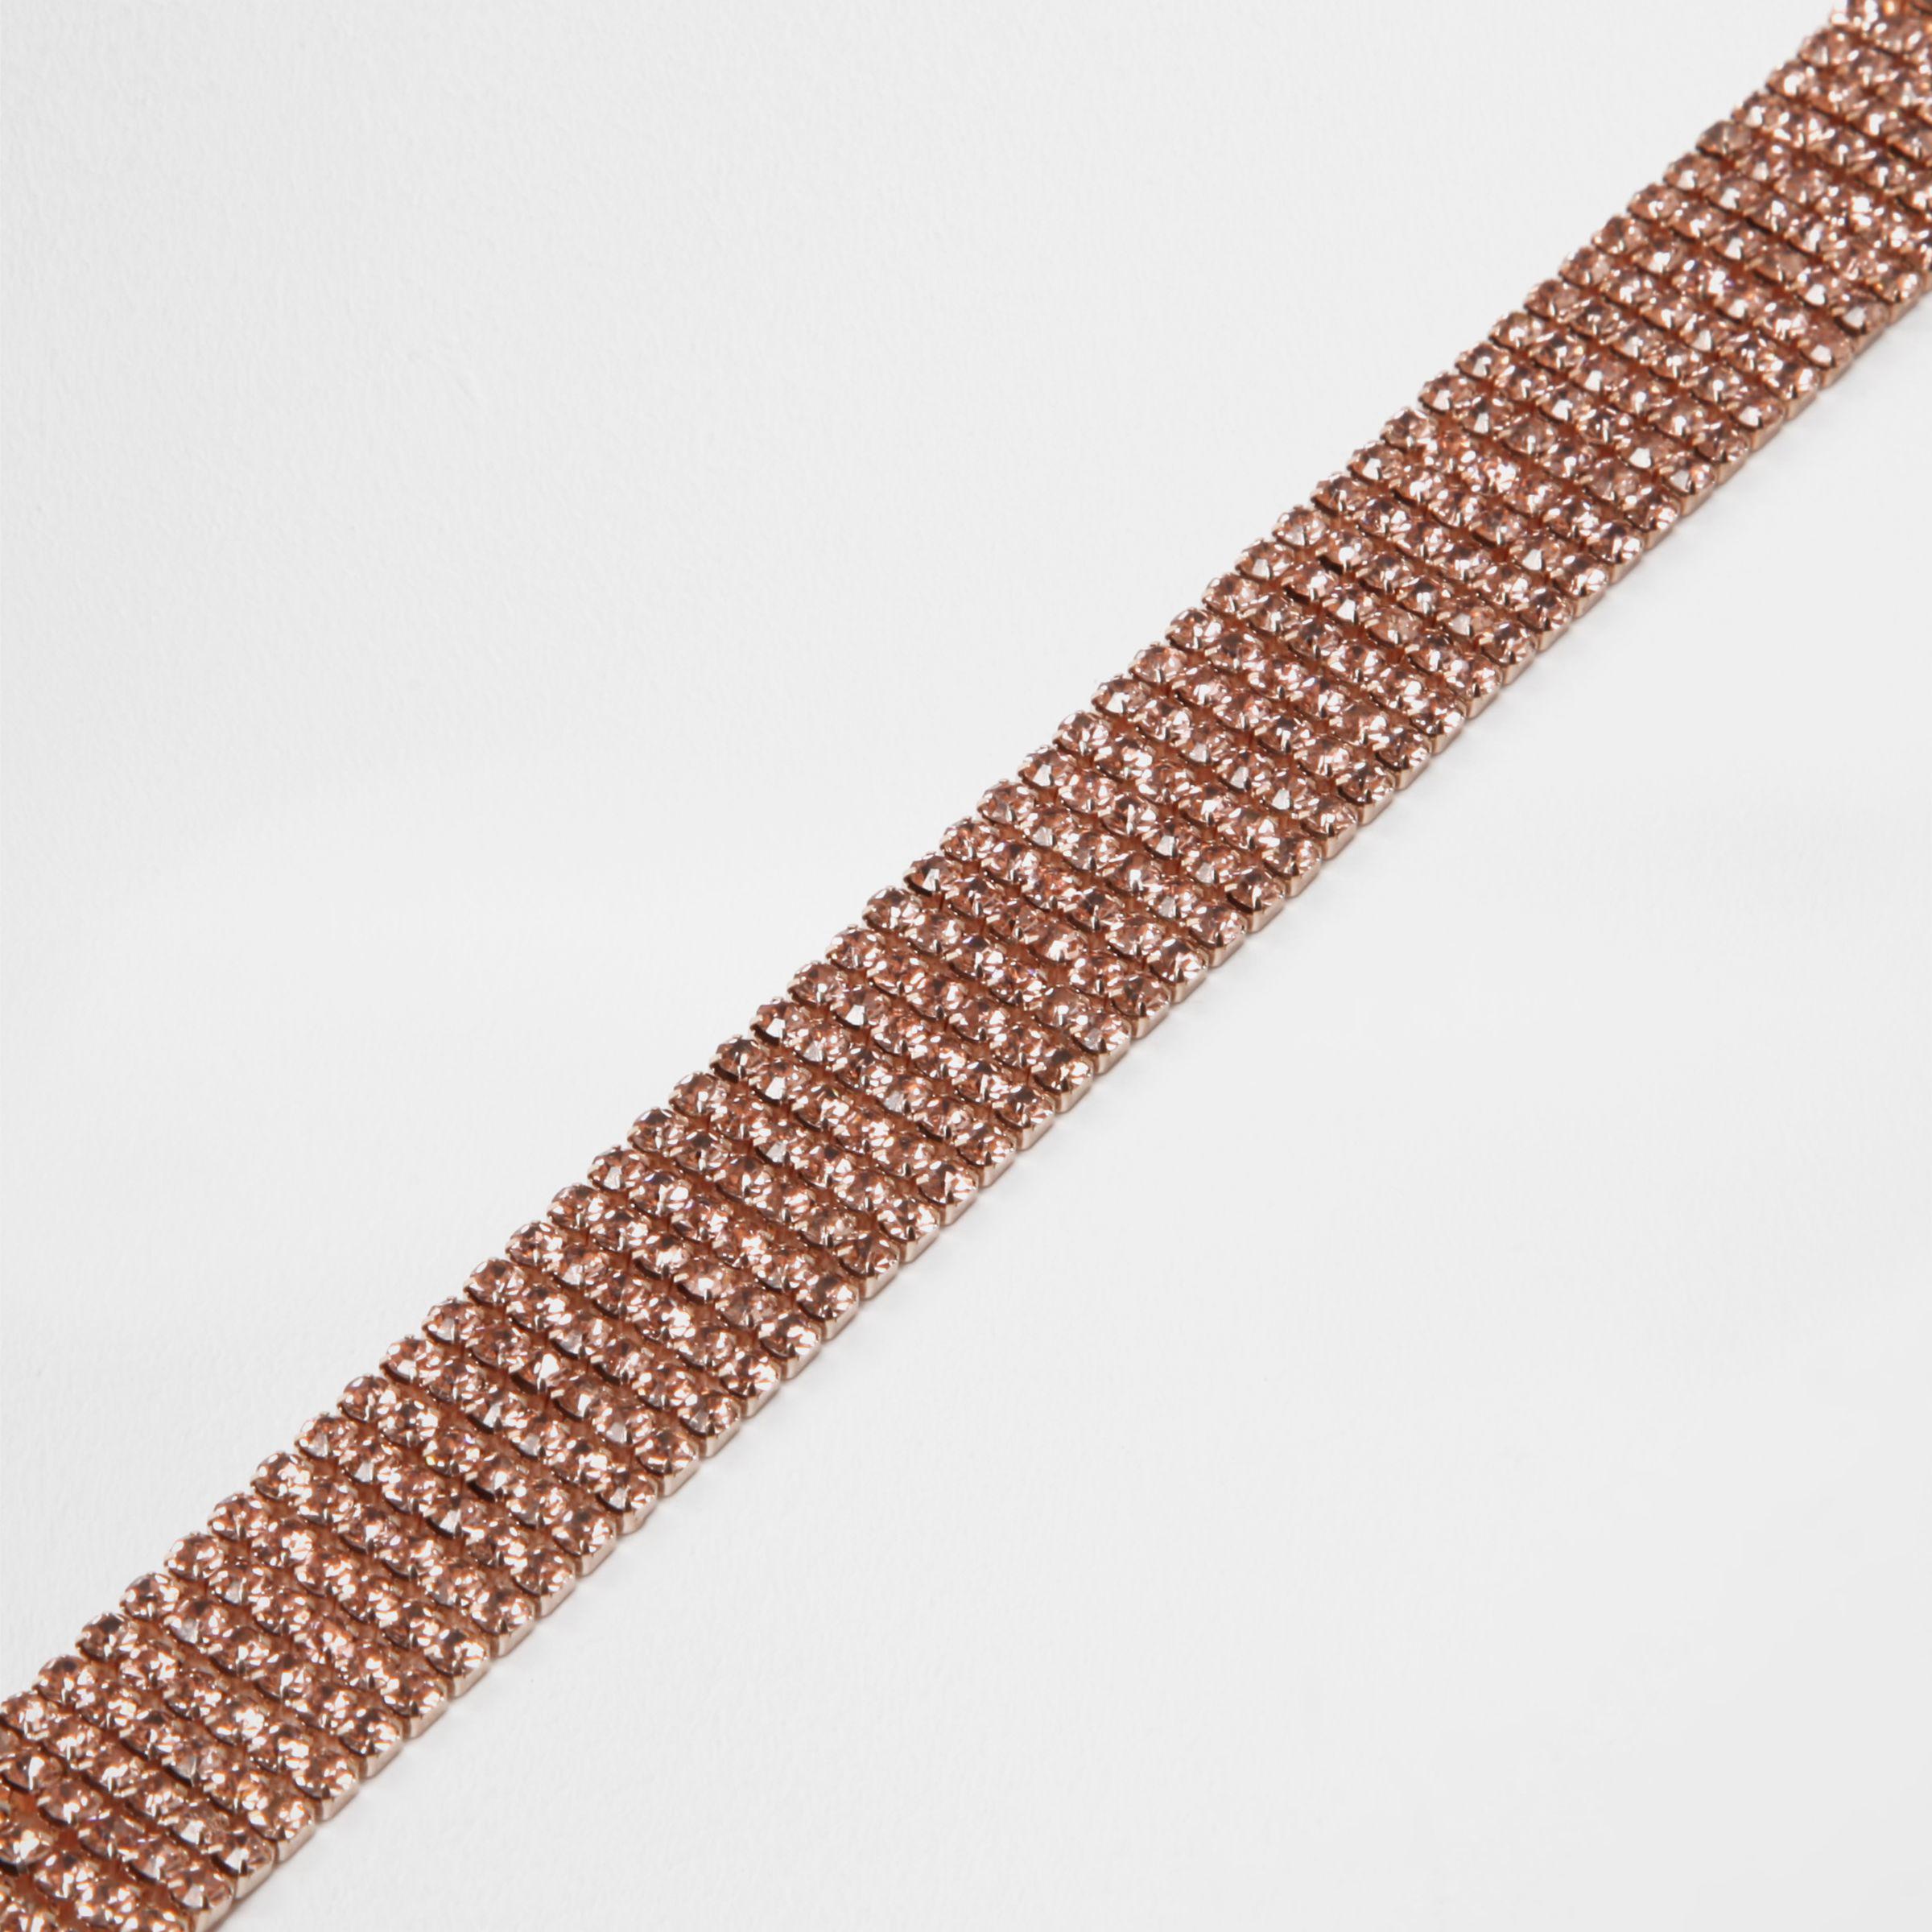 River Island Rose Gold Tone Diamante Choker Necklace Set